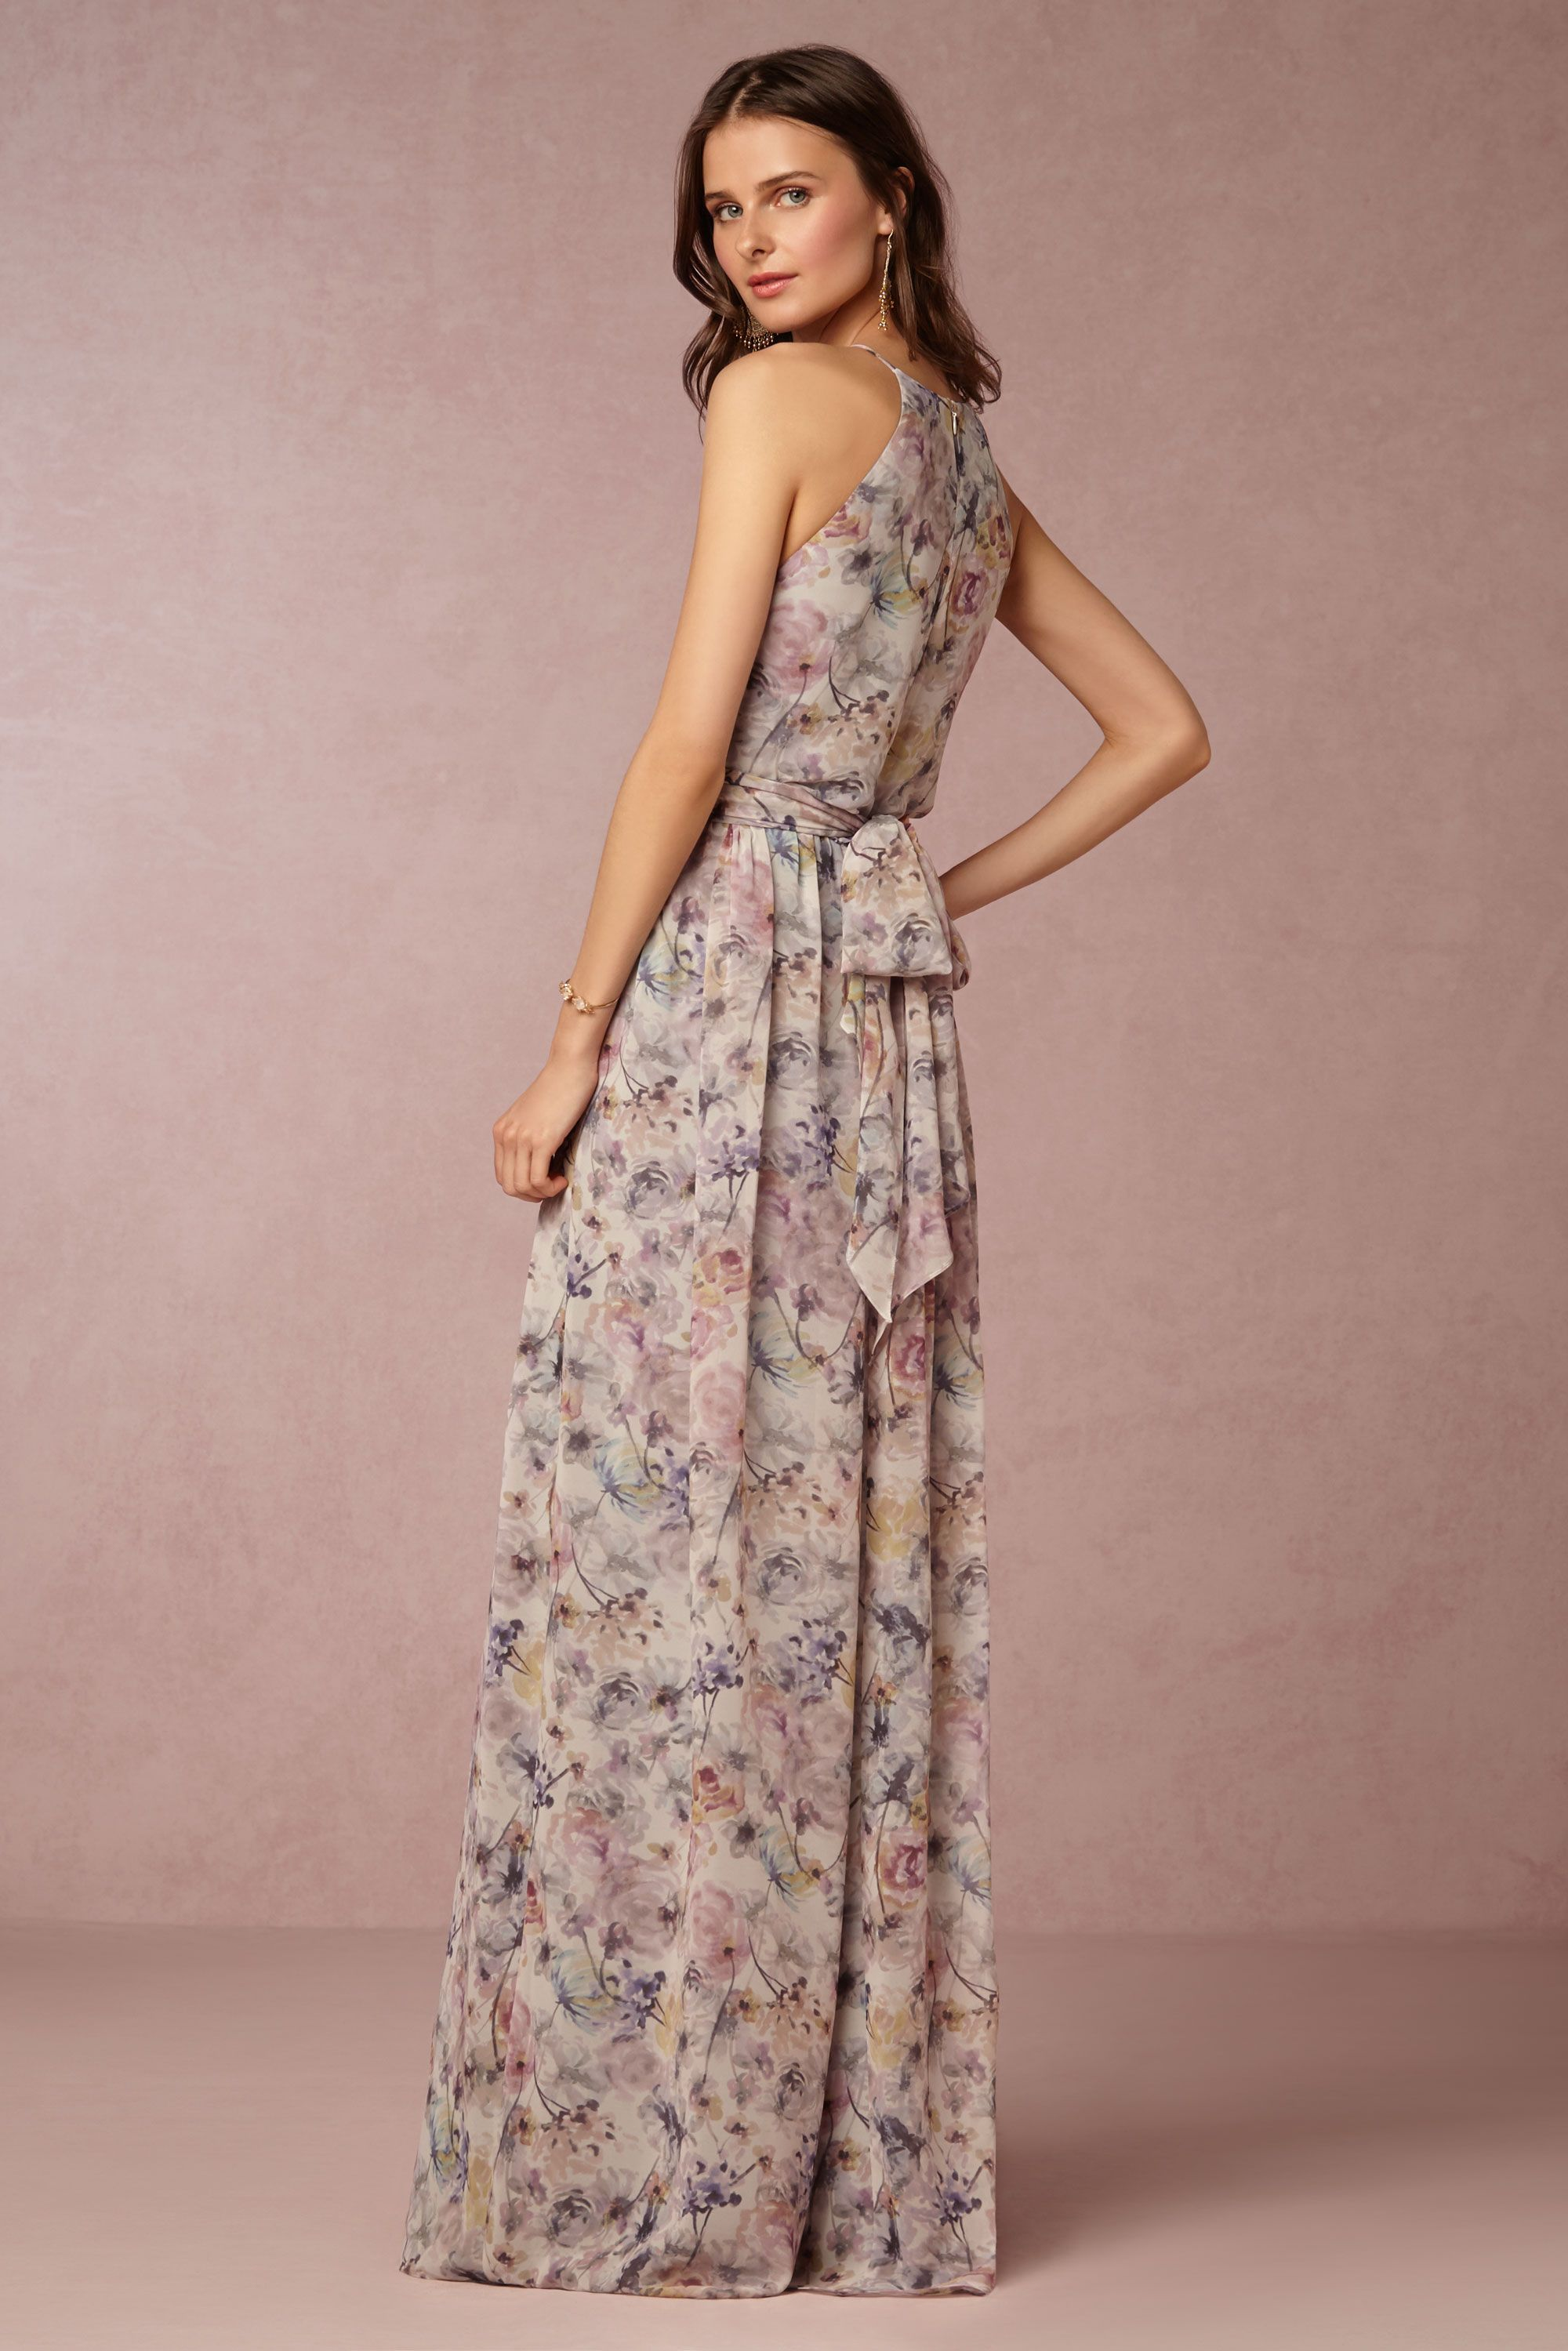 e1fe9b67c4e Bhldn Alana Dress In Bridesmaids Bridesmaid Dresses At Bhldn